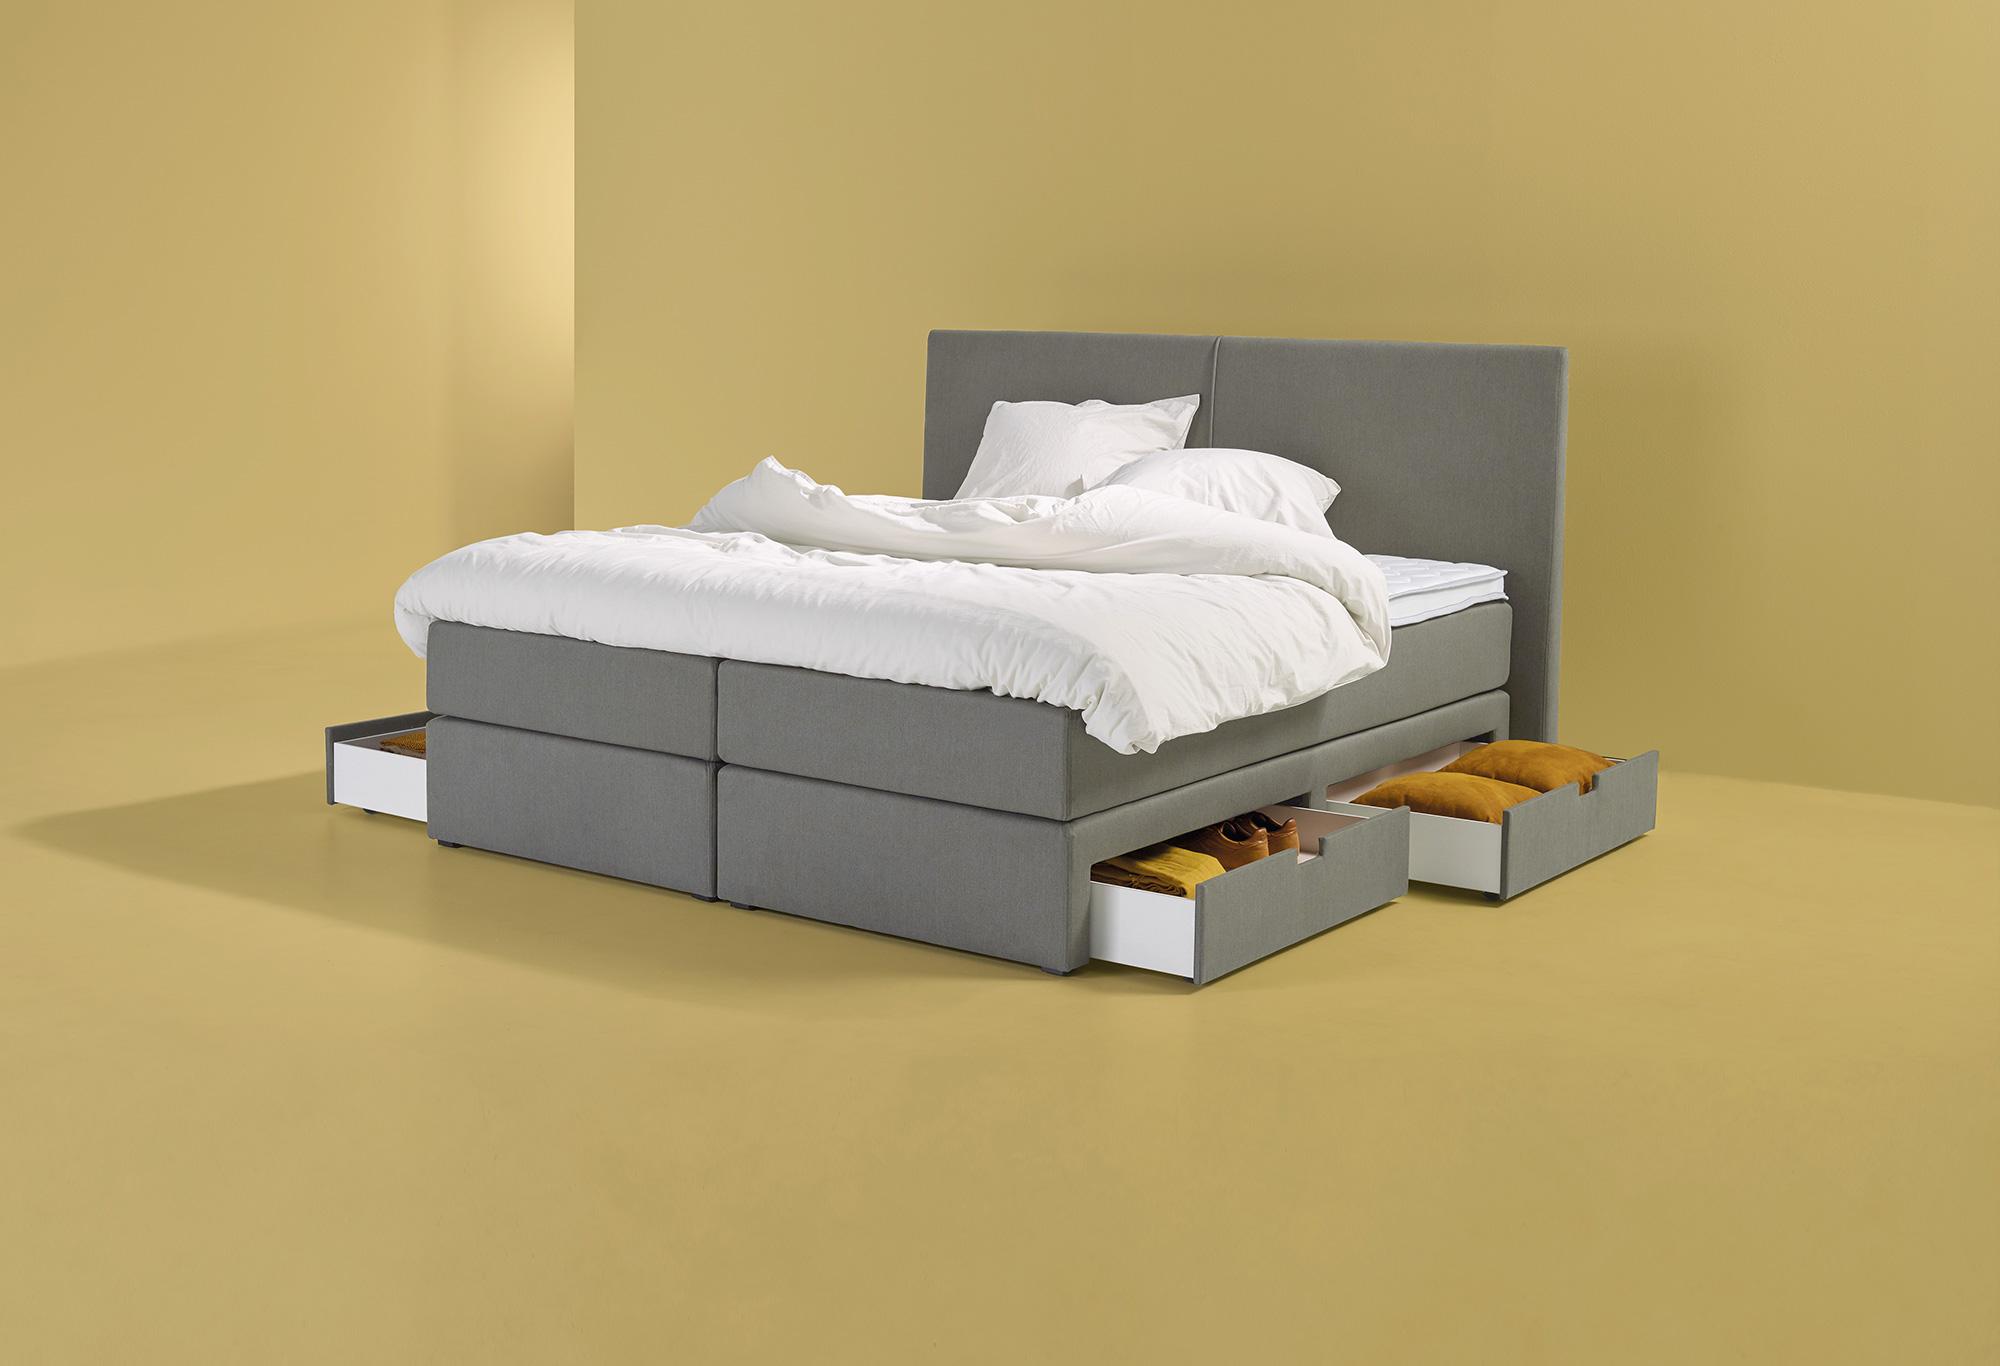 Boxspringbett Smart Storage 03 - Sofort lieferbar  Swiss Sense